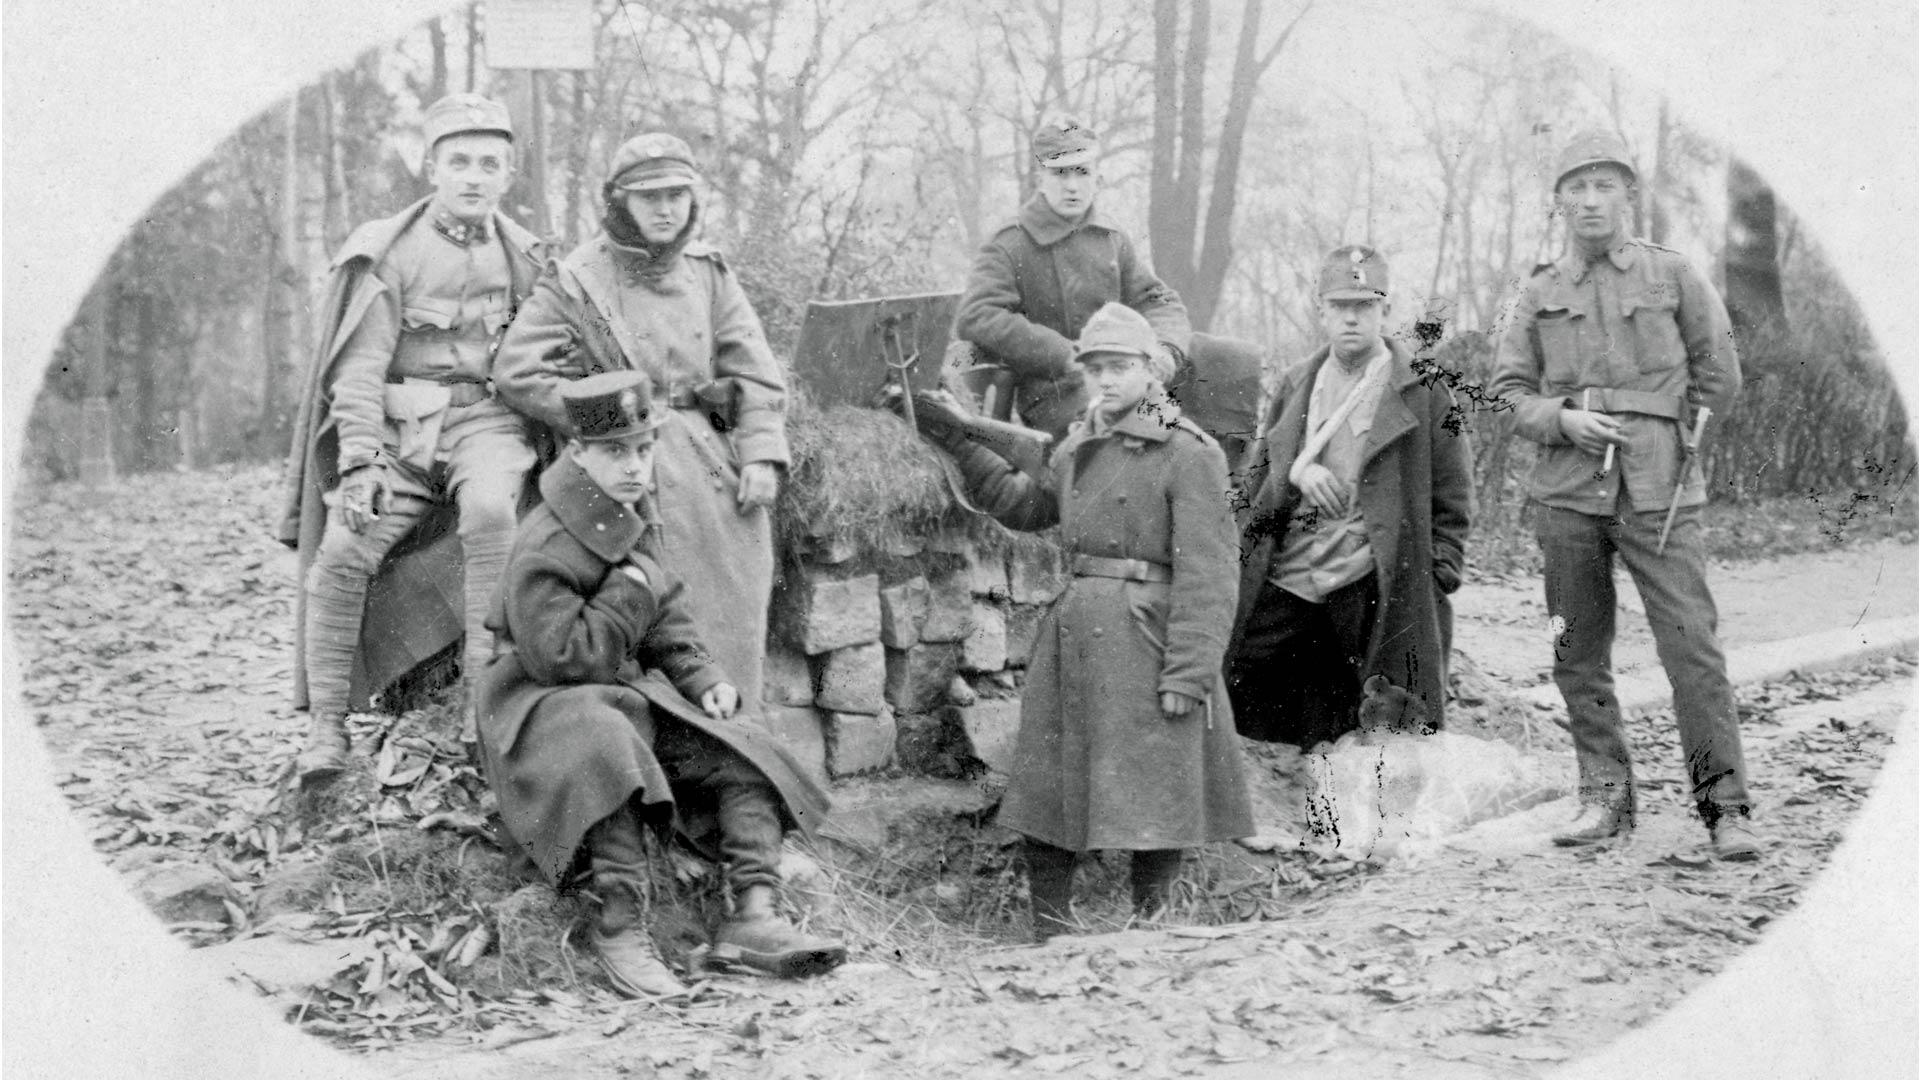 Obrońcy Lwowa, fot. NAC, 1-H-356-1